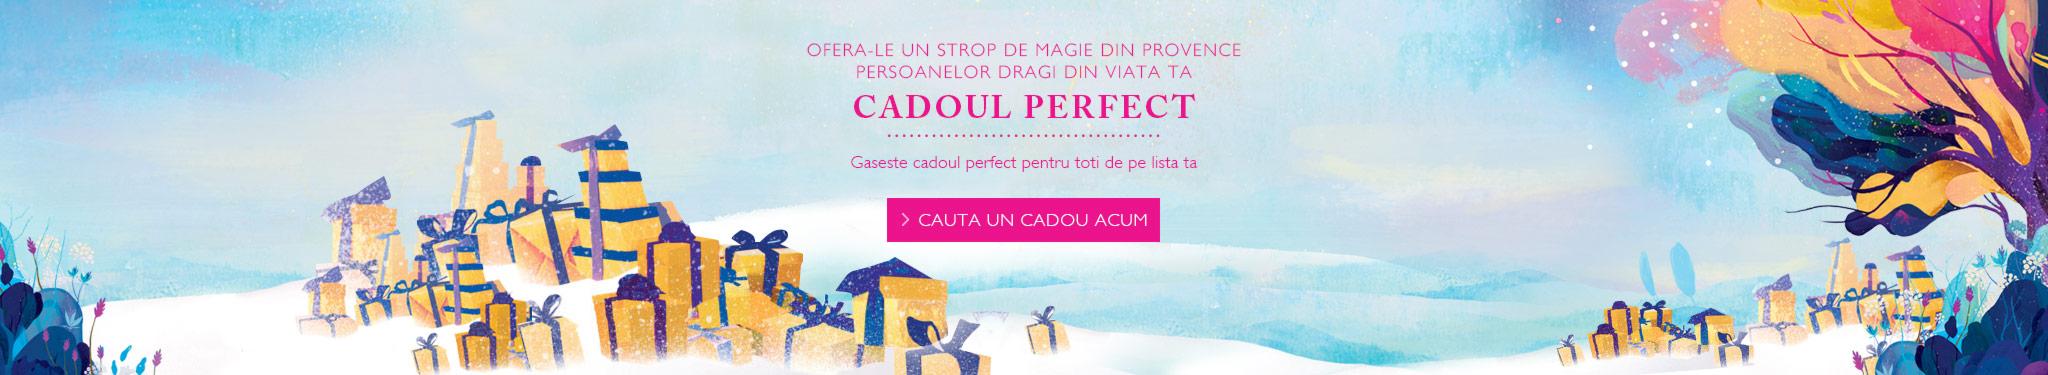 Cauta Cadoul Perfect